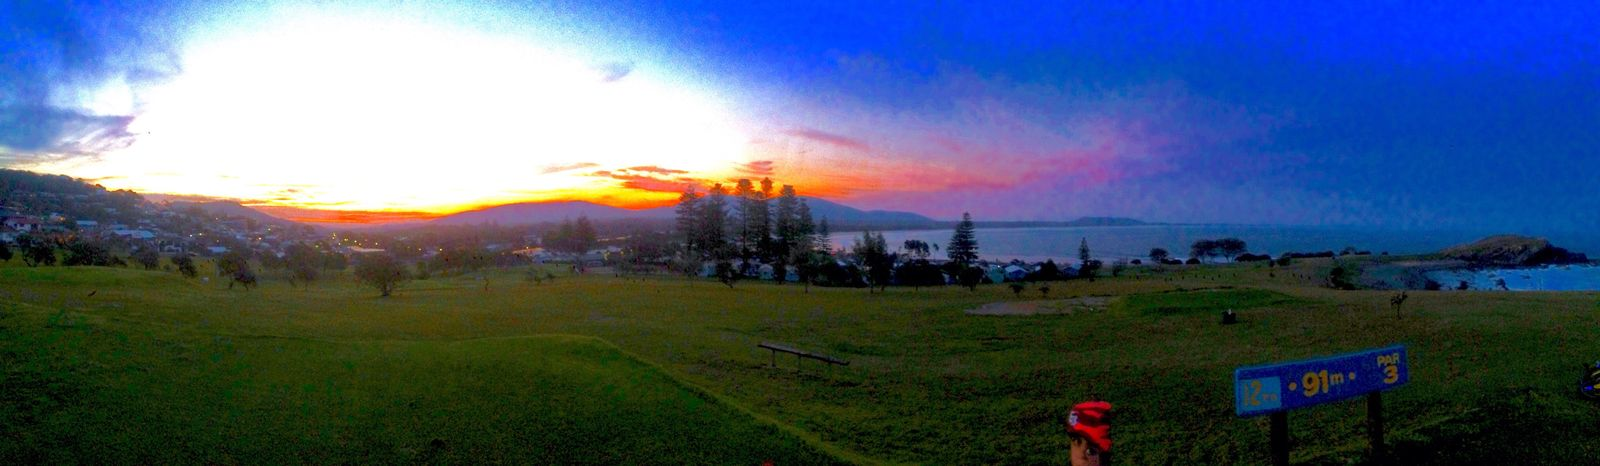 Beautiful sunset at an amazing place